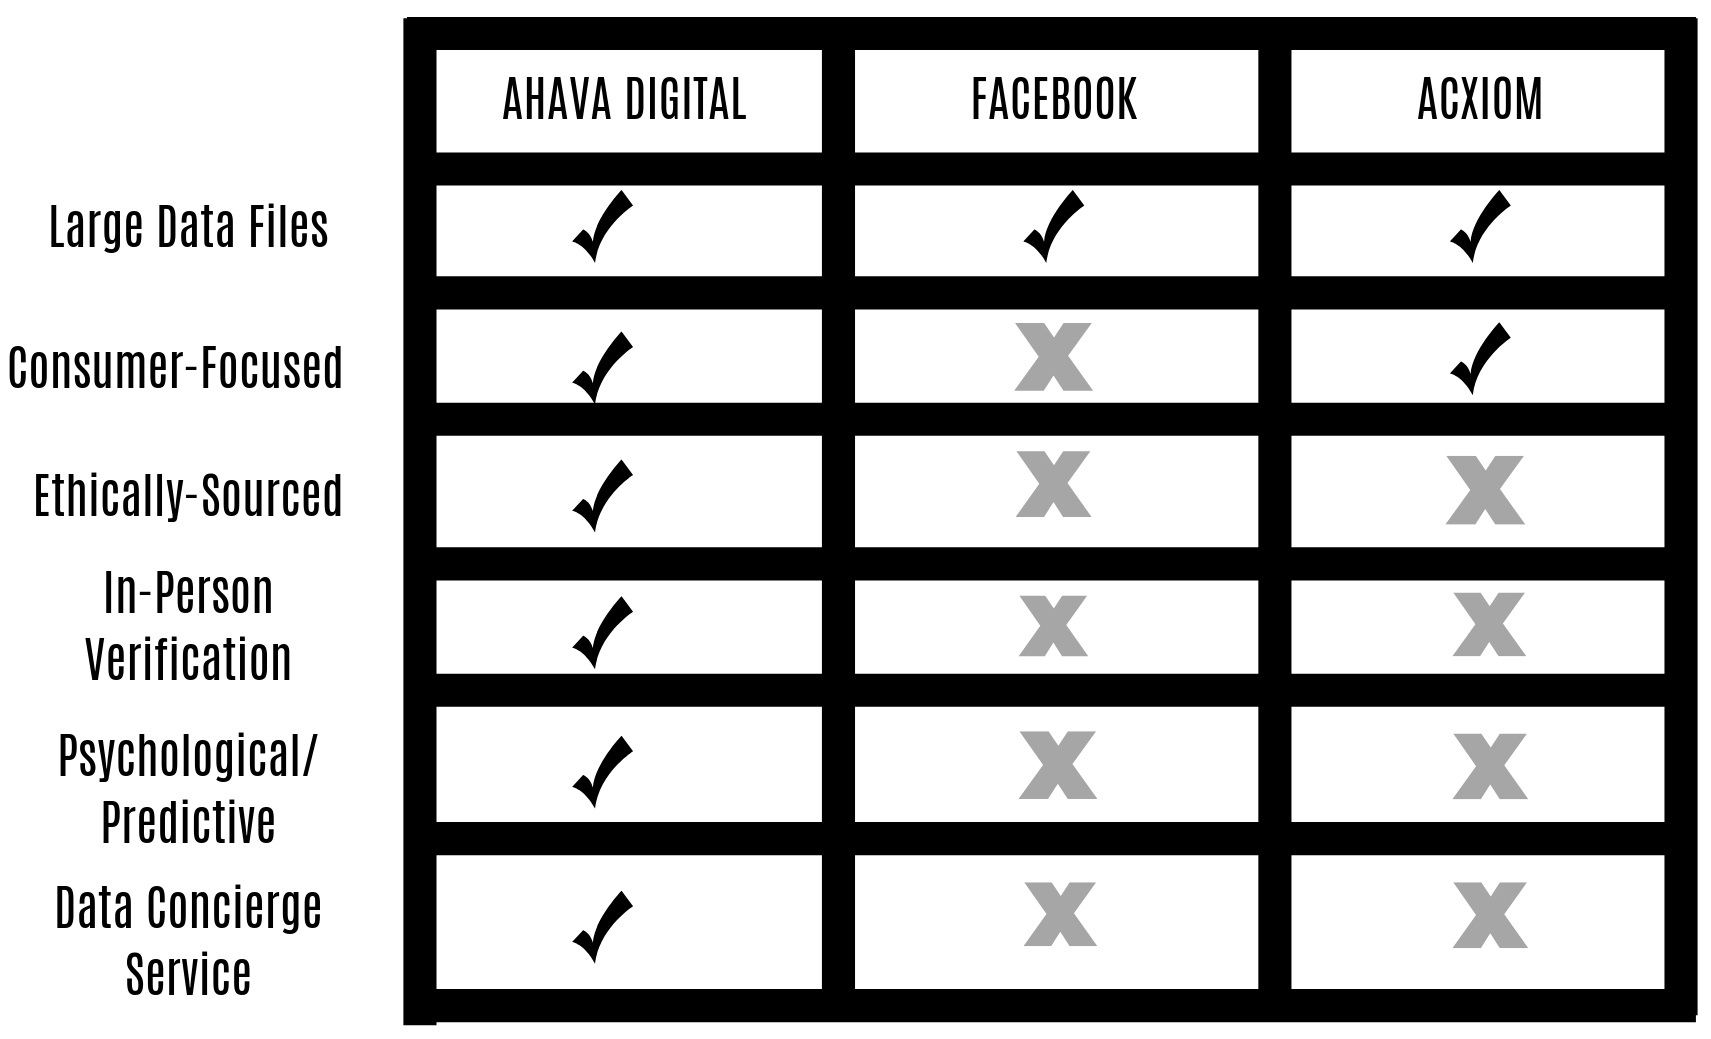 ADG%2C+Acxiom%2C+Facebook+Comparison+Chart+%281%29.jpg